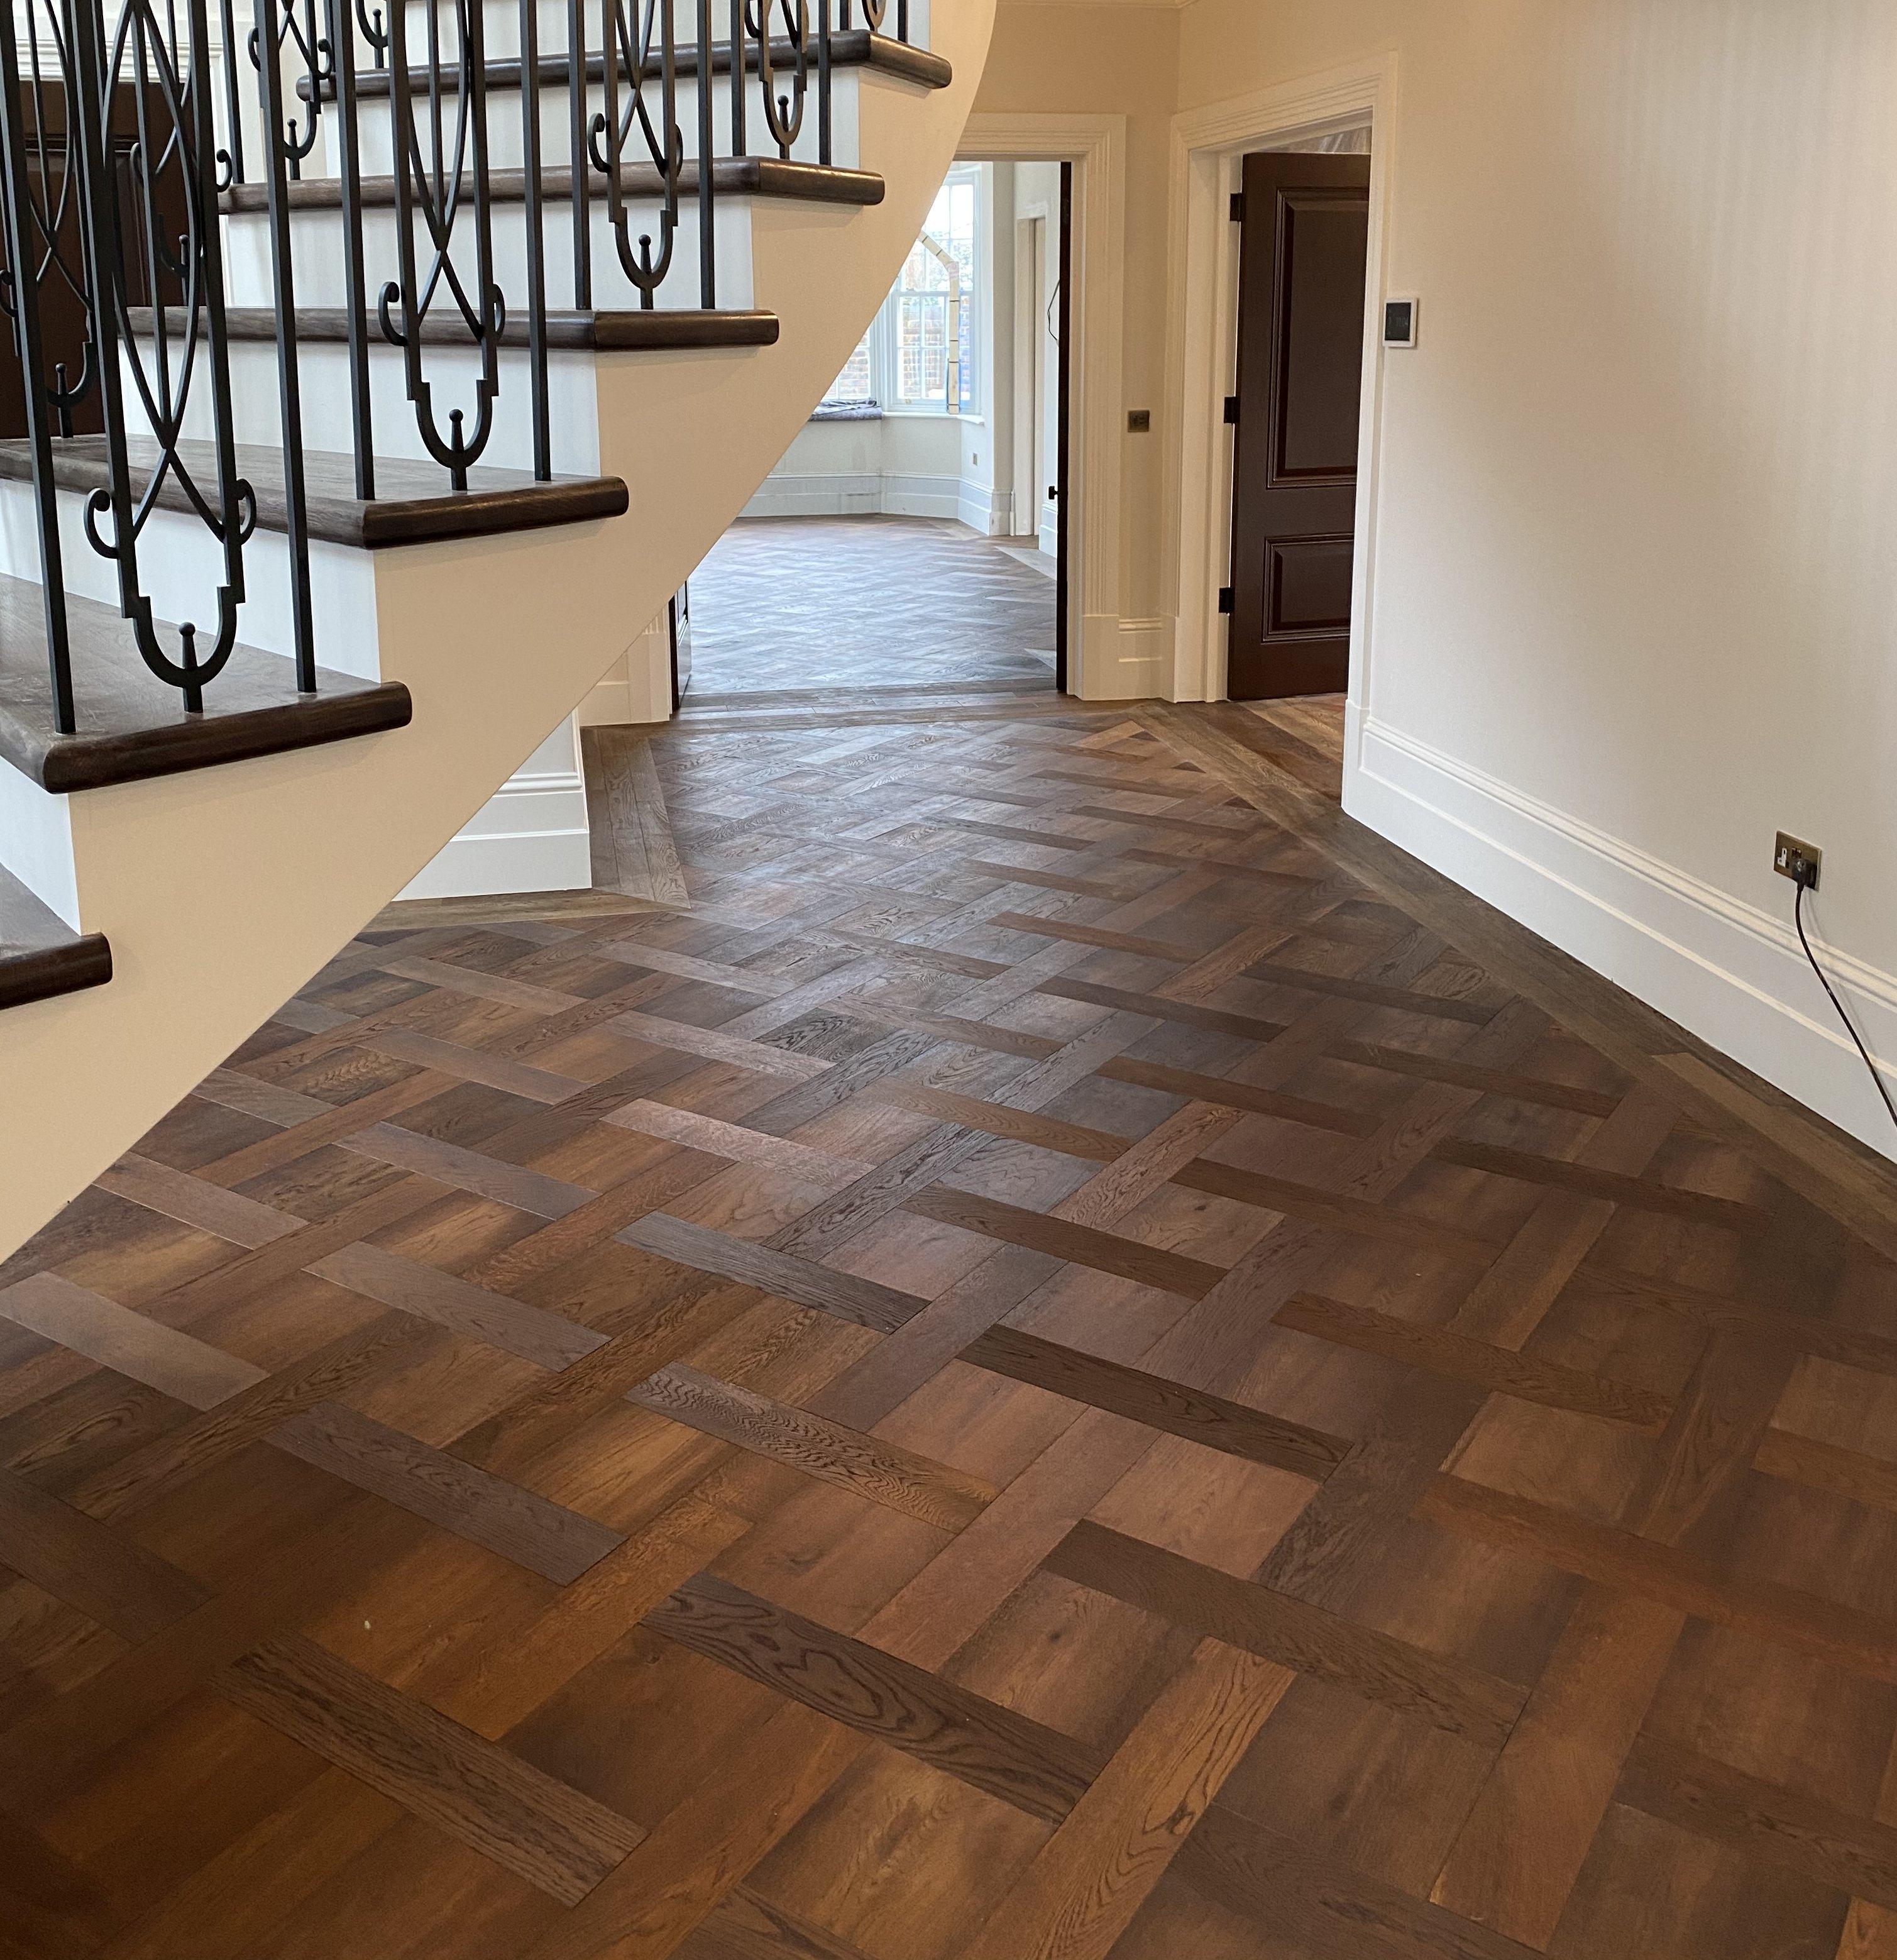 New Herringbone Basket weave pattern parquet wood flooring TW E931